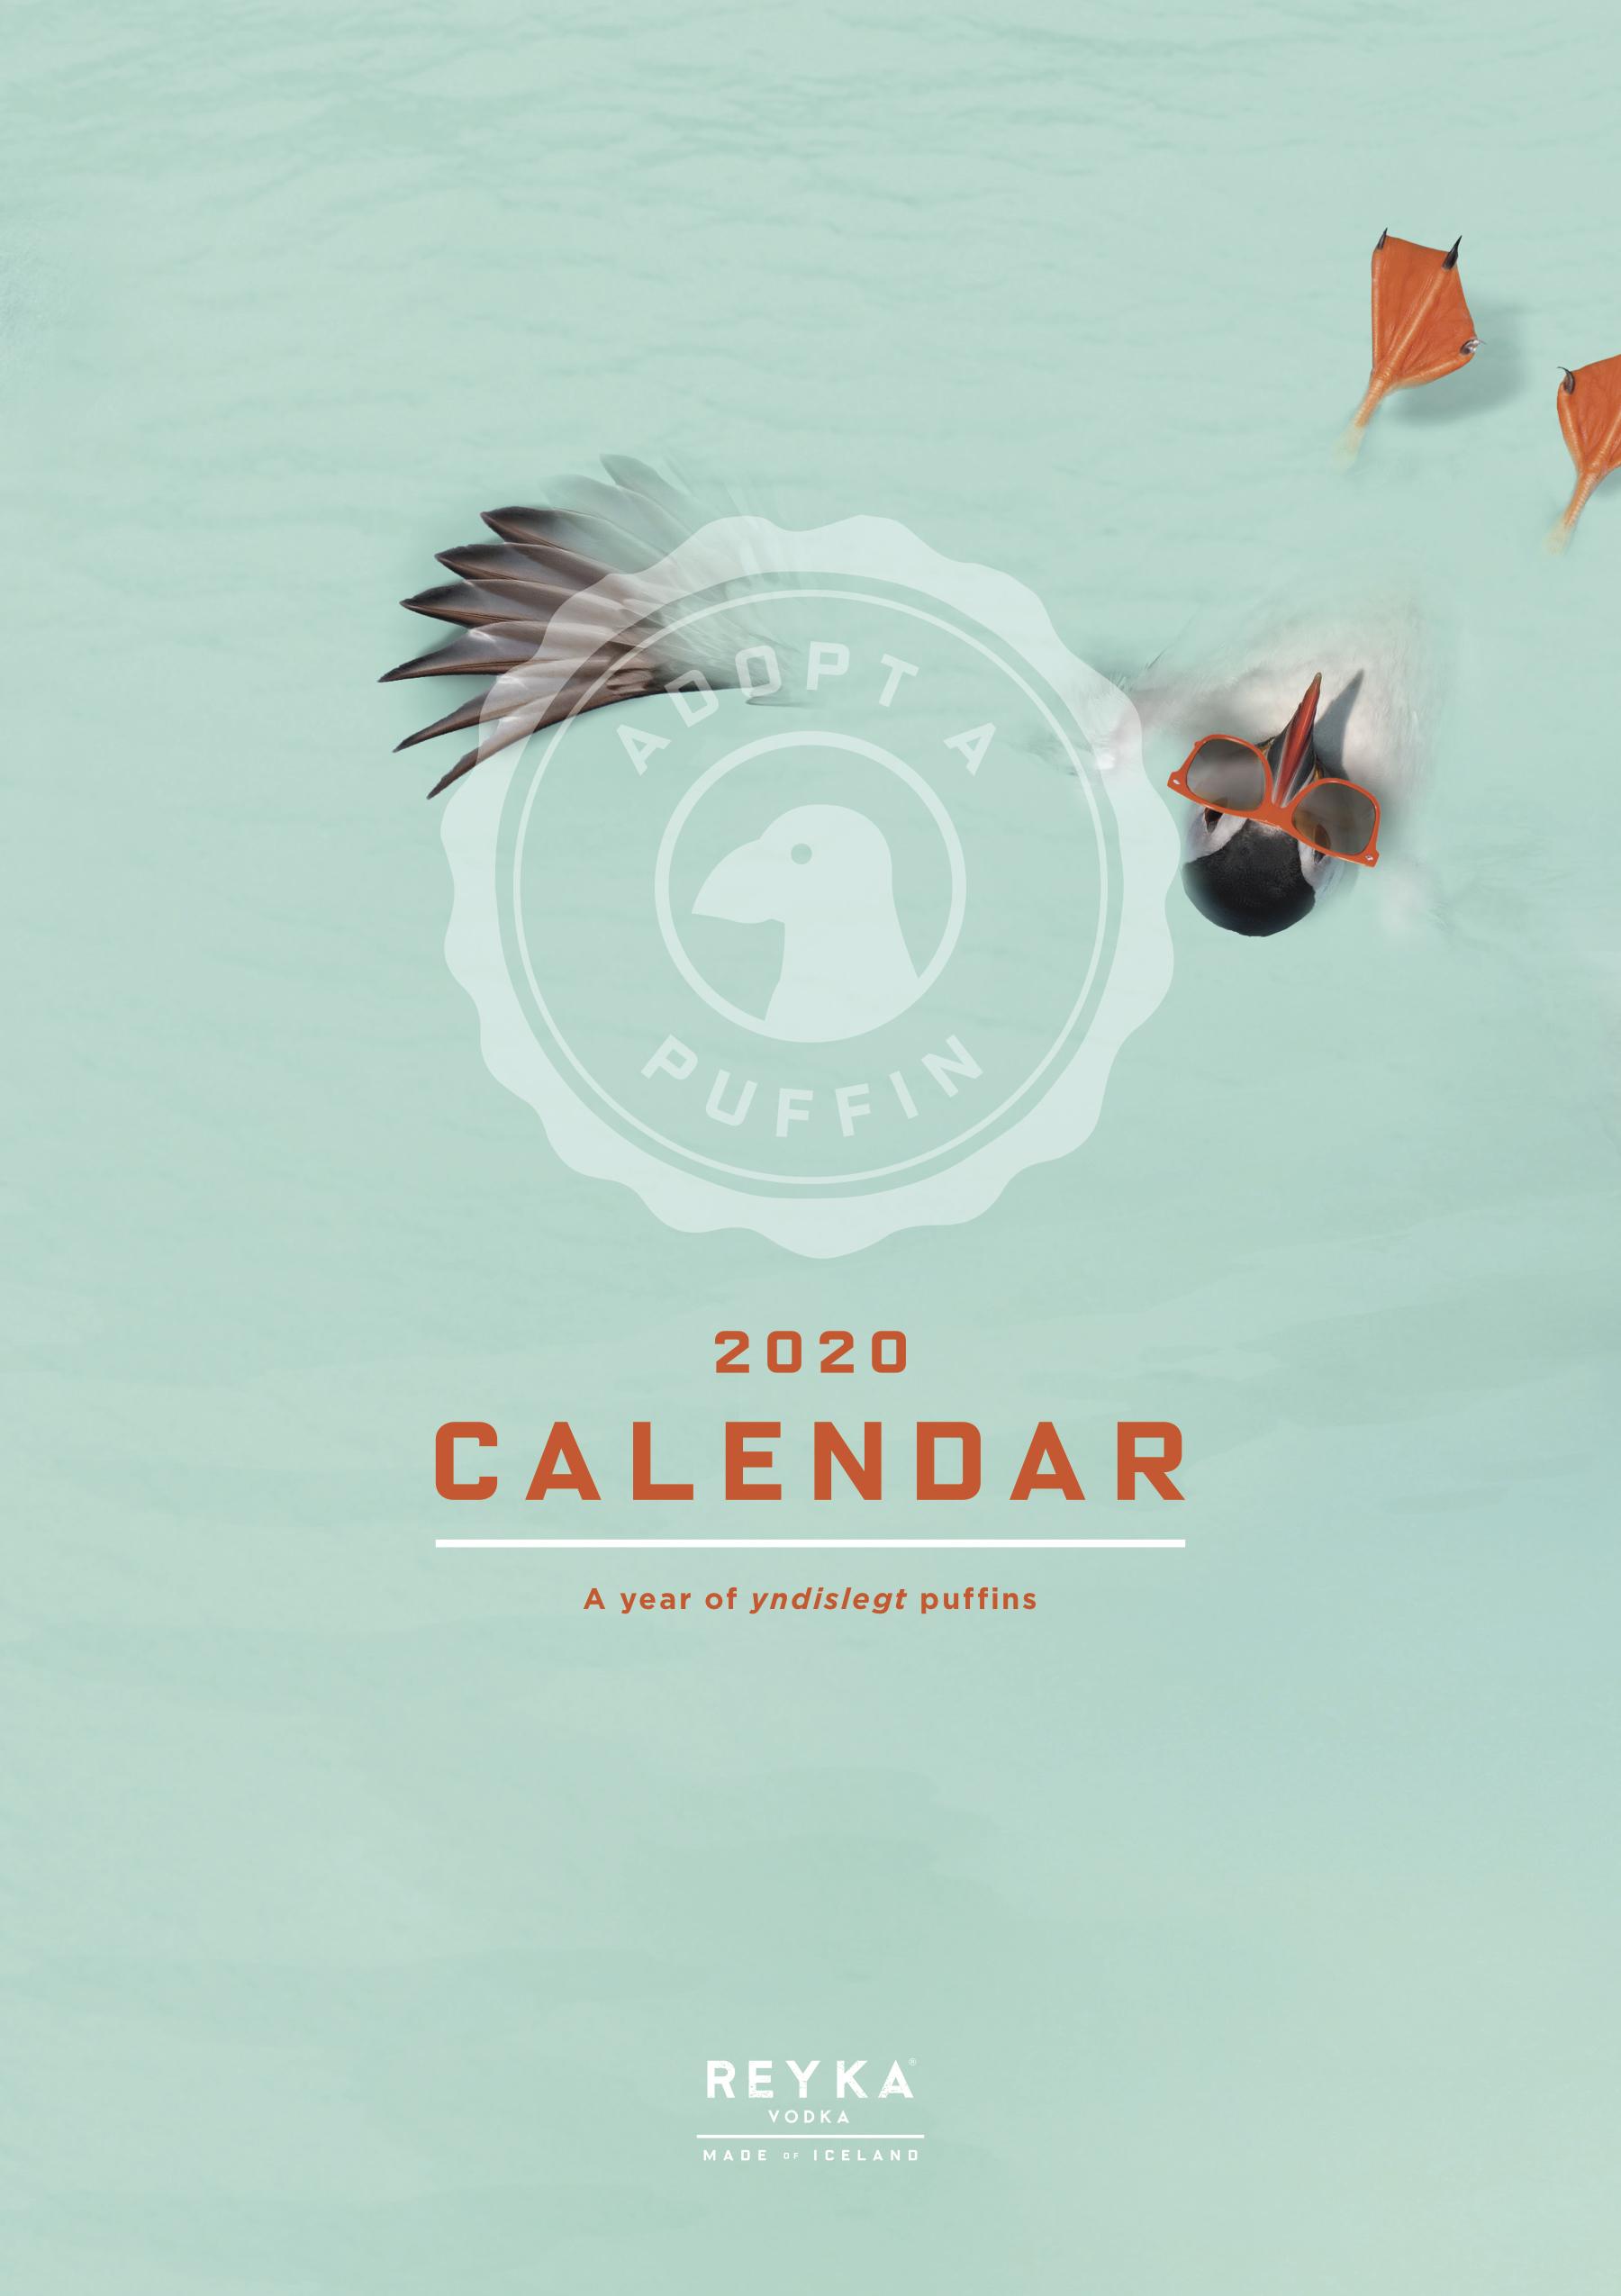 Reyka_adoptpuffin_calendar_full.jpg